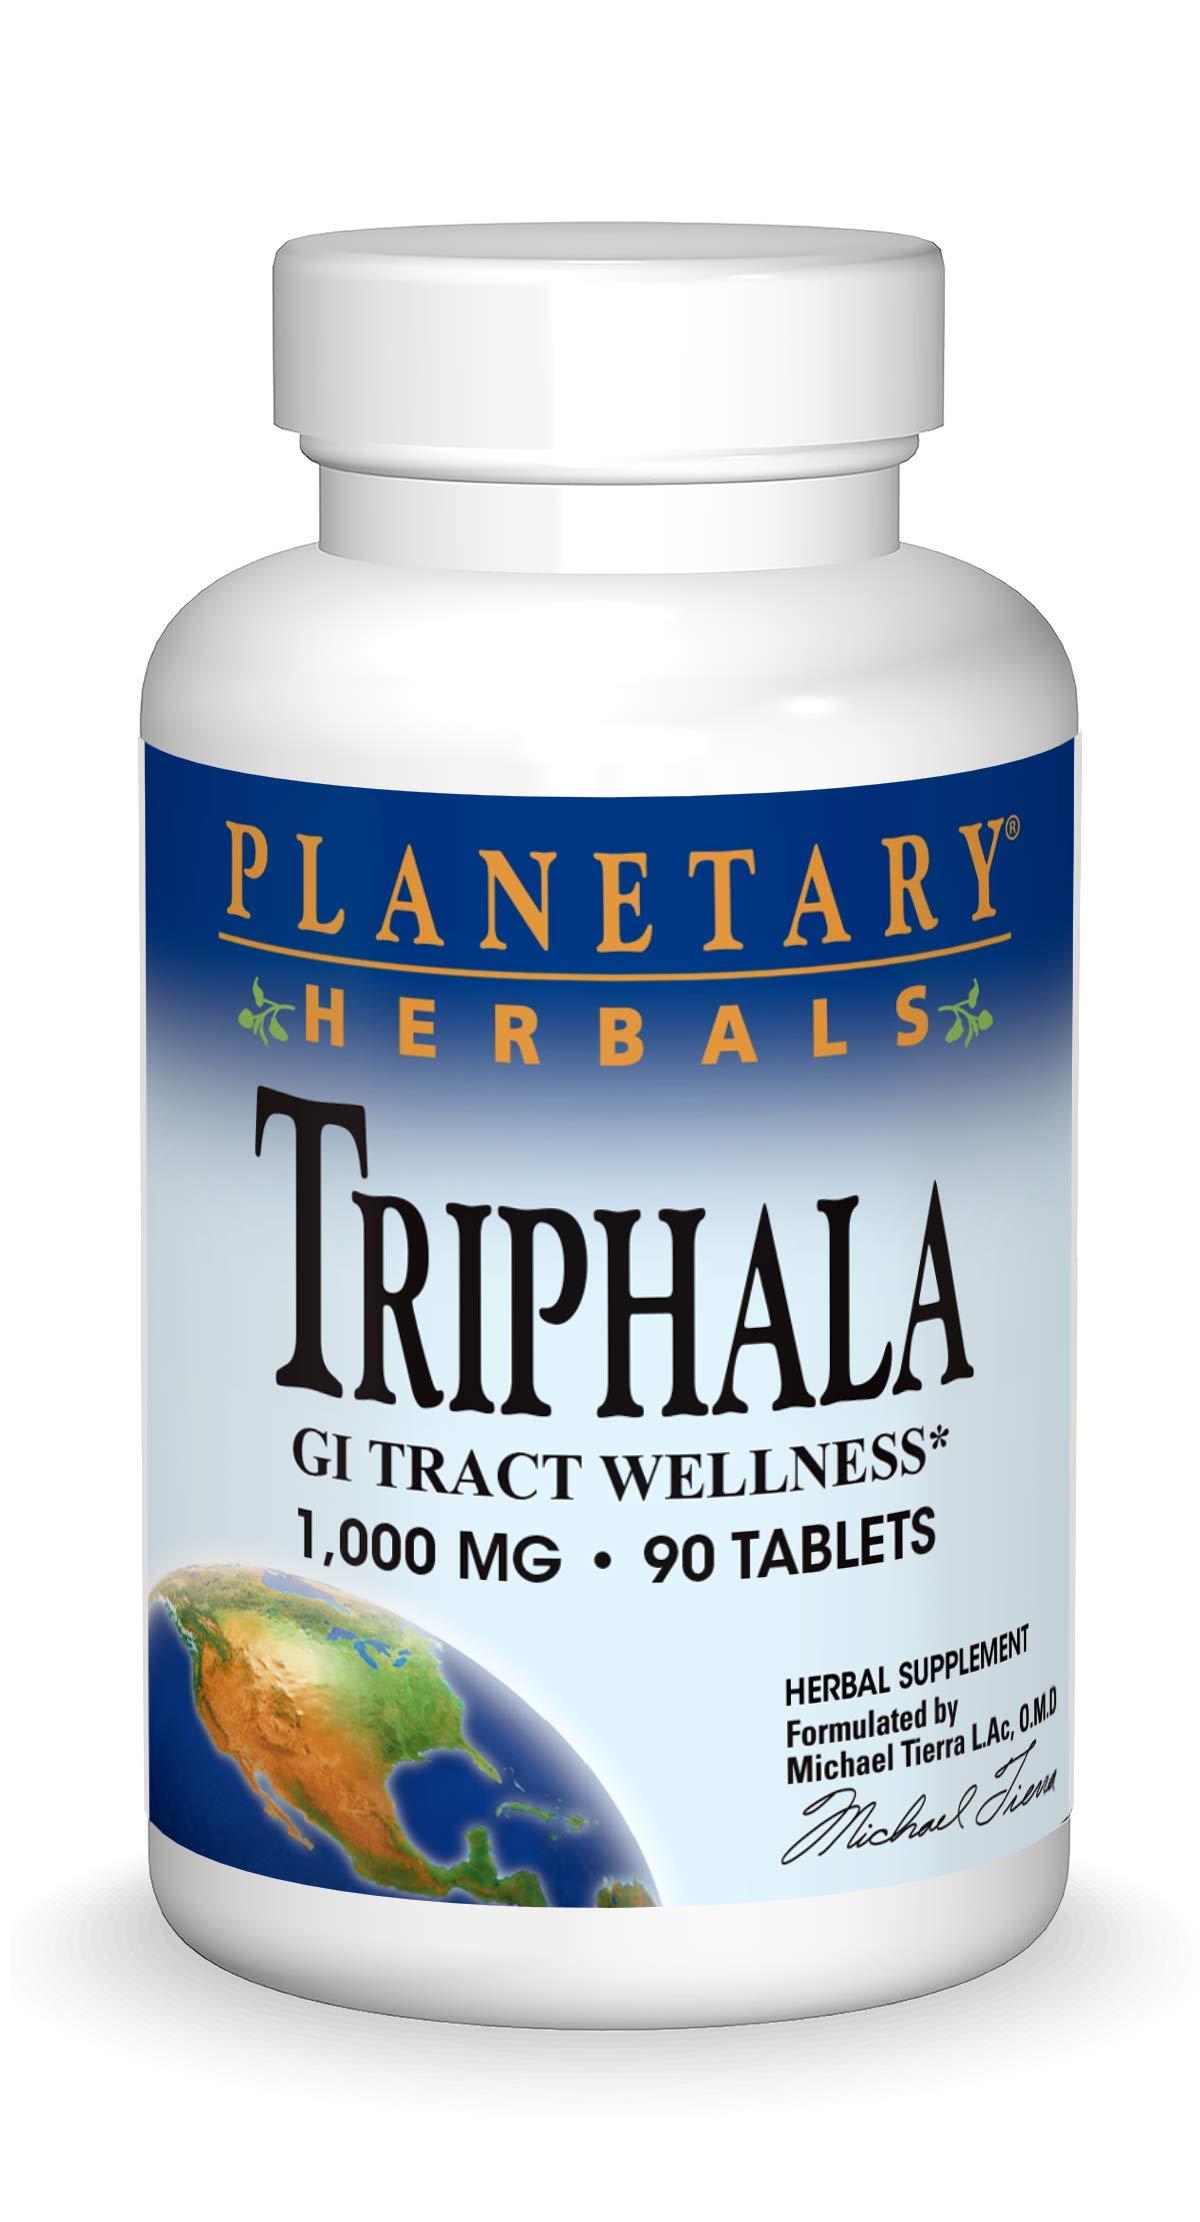 Planetary Herbals Triphala 1000mg - 90 Tablets